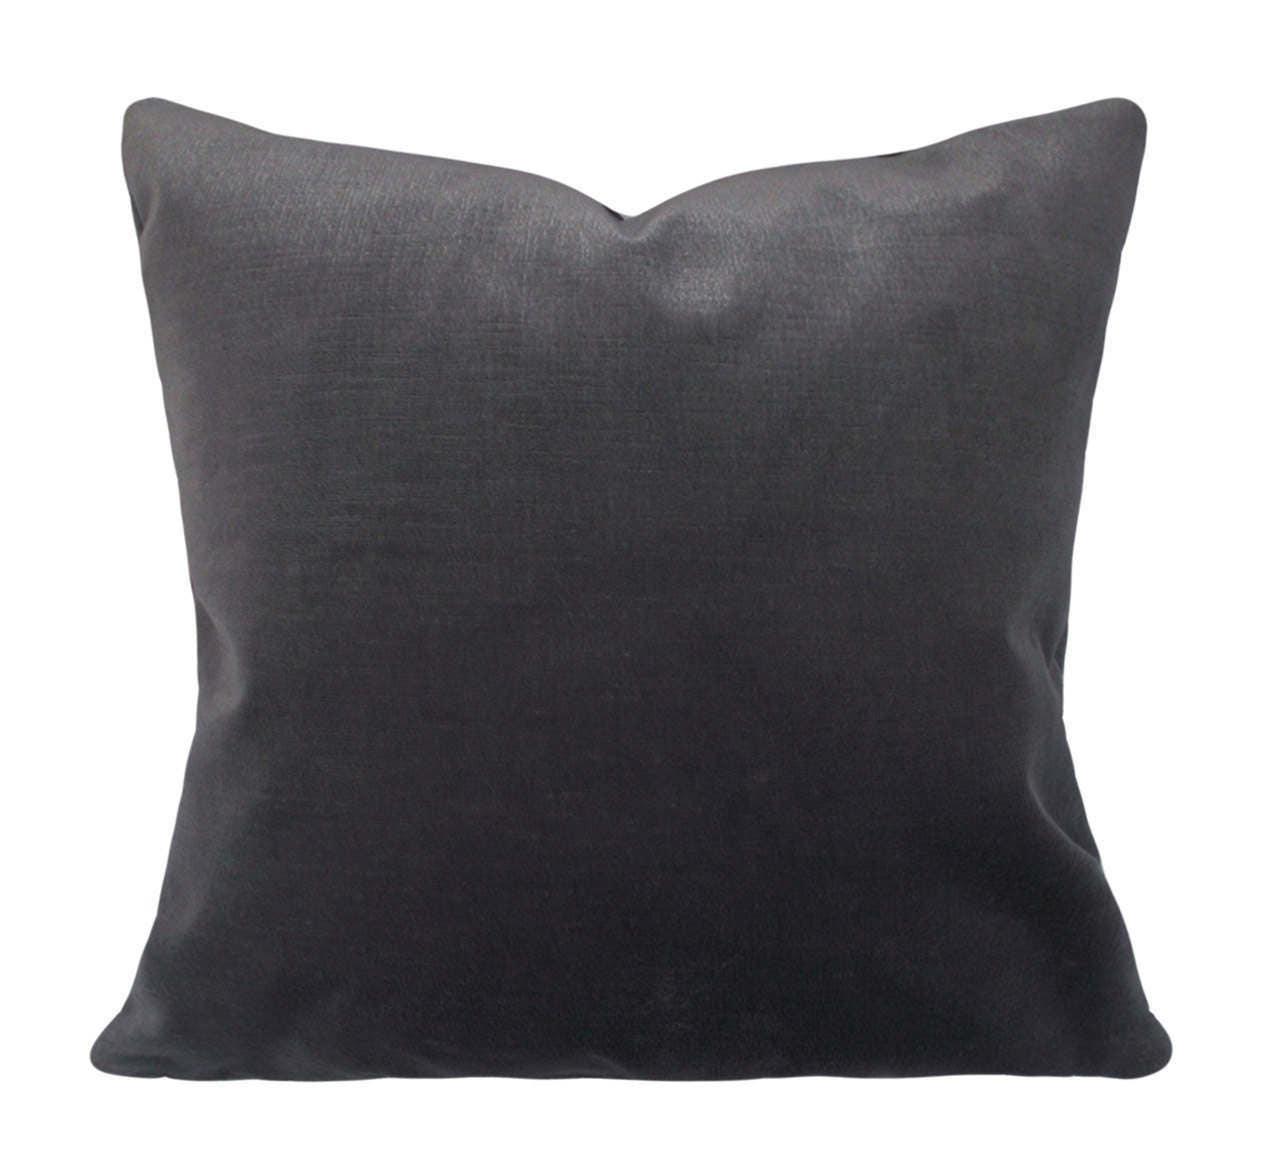 Grey Velvet Pillow Cover Decorative Pillow Throw Pillow